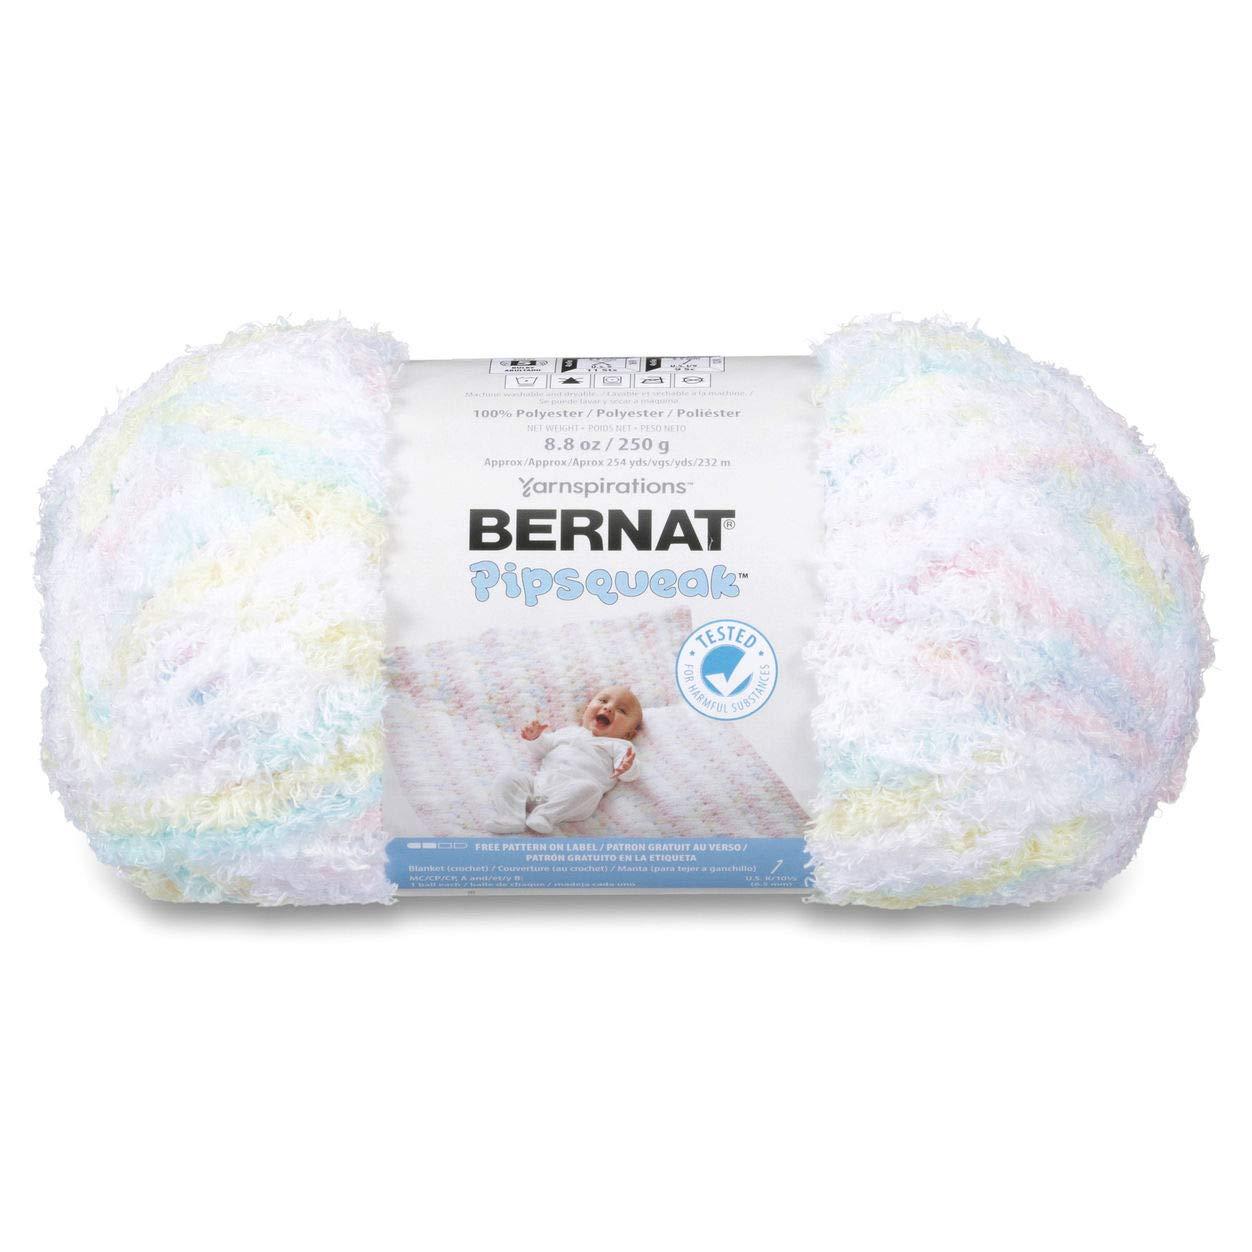 Bernat Pipsqueak Big Ball Yarn, 8.8 oz, Gauge 5 Bulky, Baby Baby Print